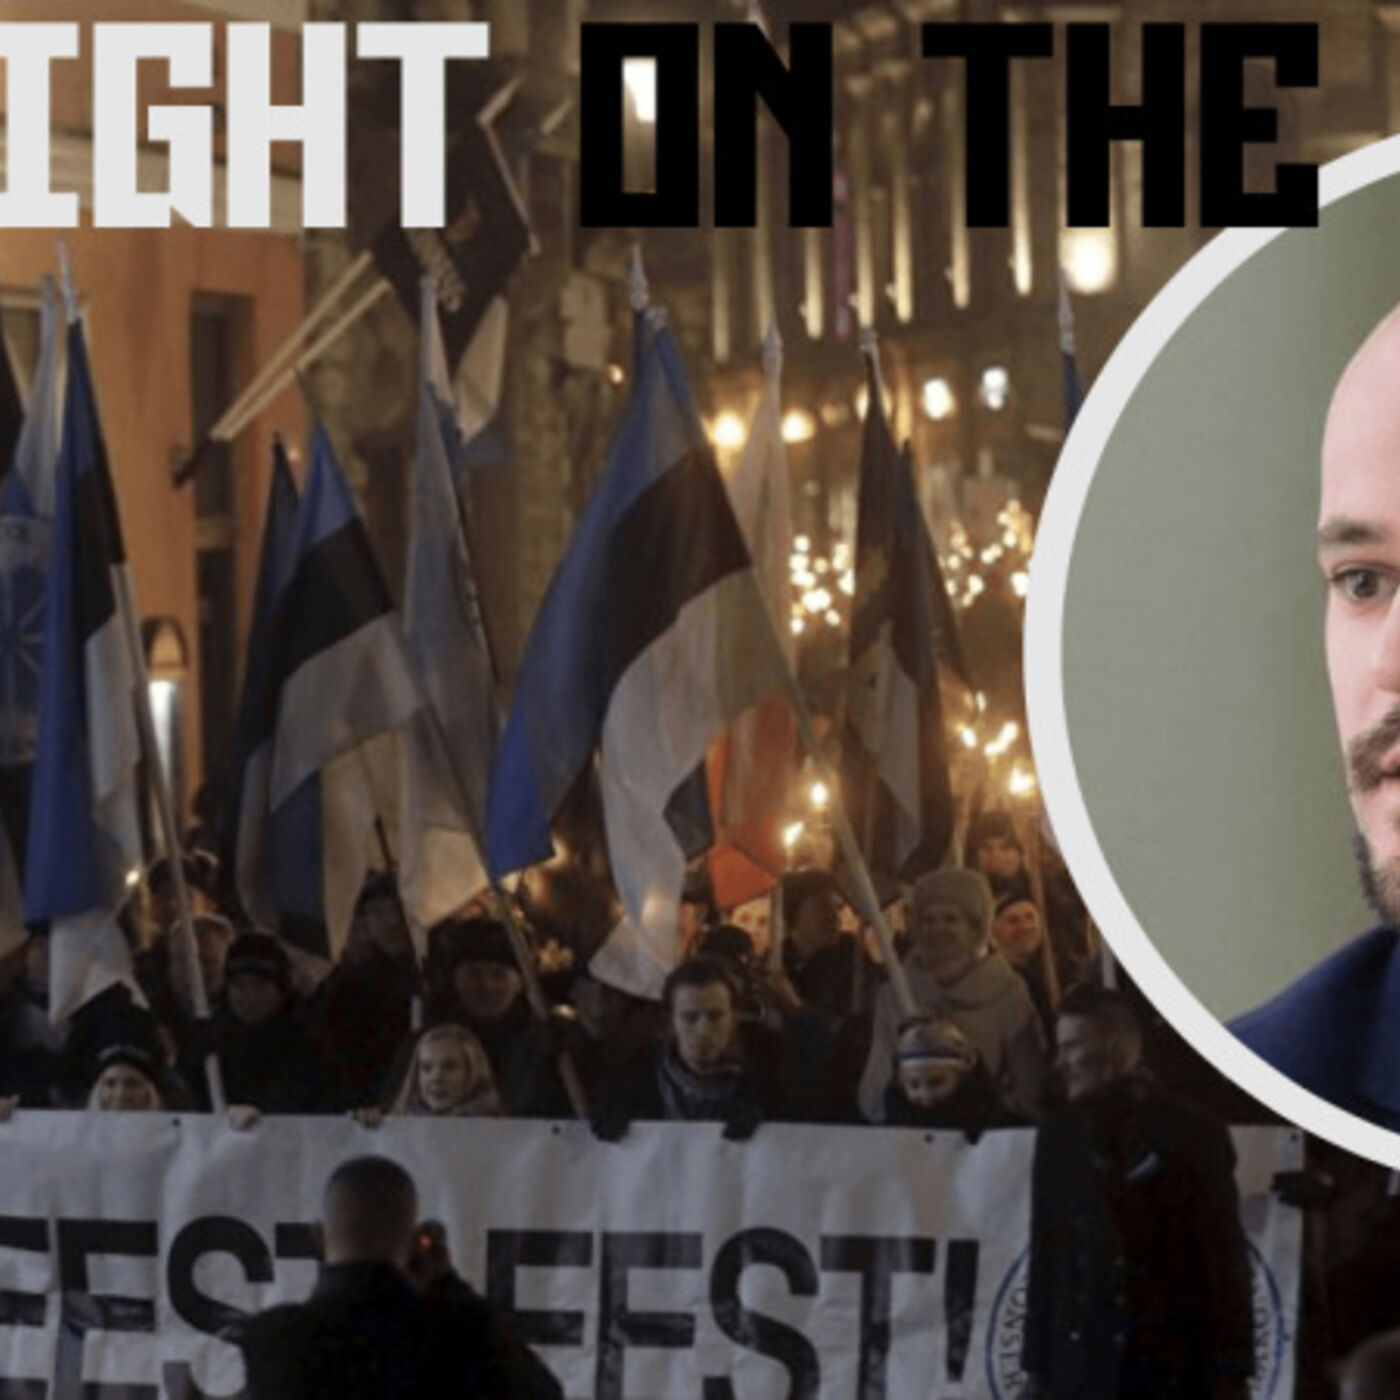 23. Louis Wierenga on EKRE and far right in Estonia